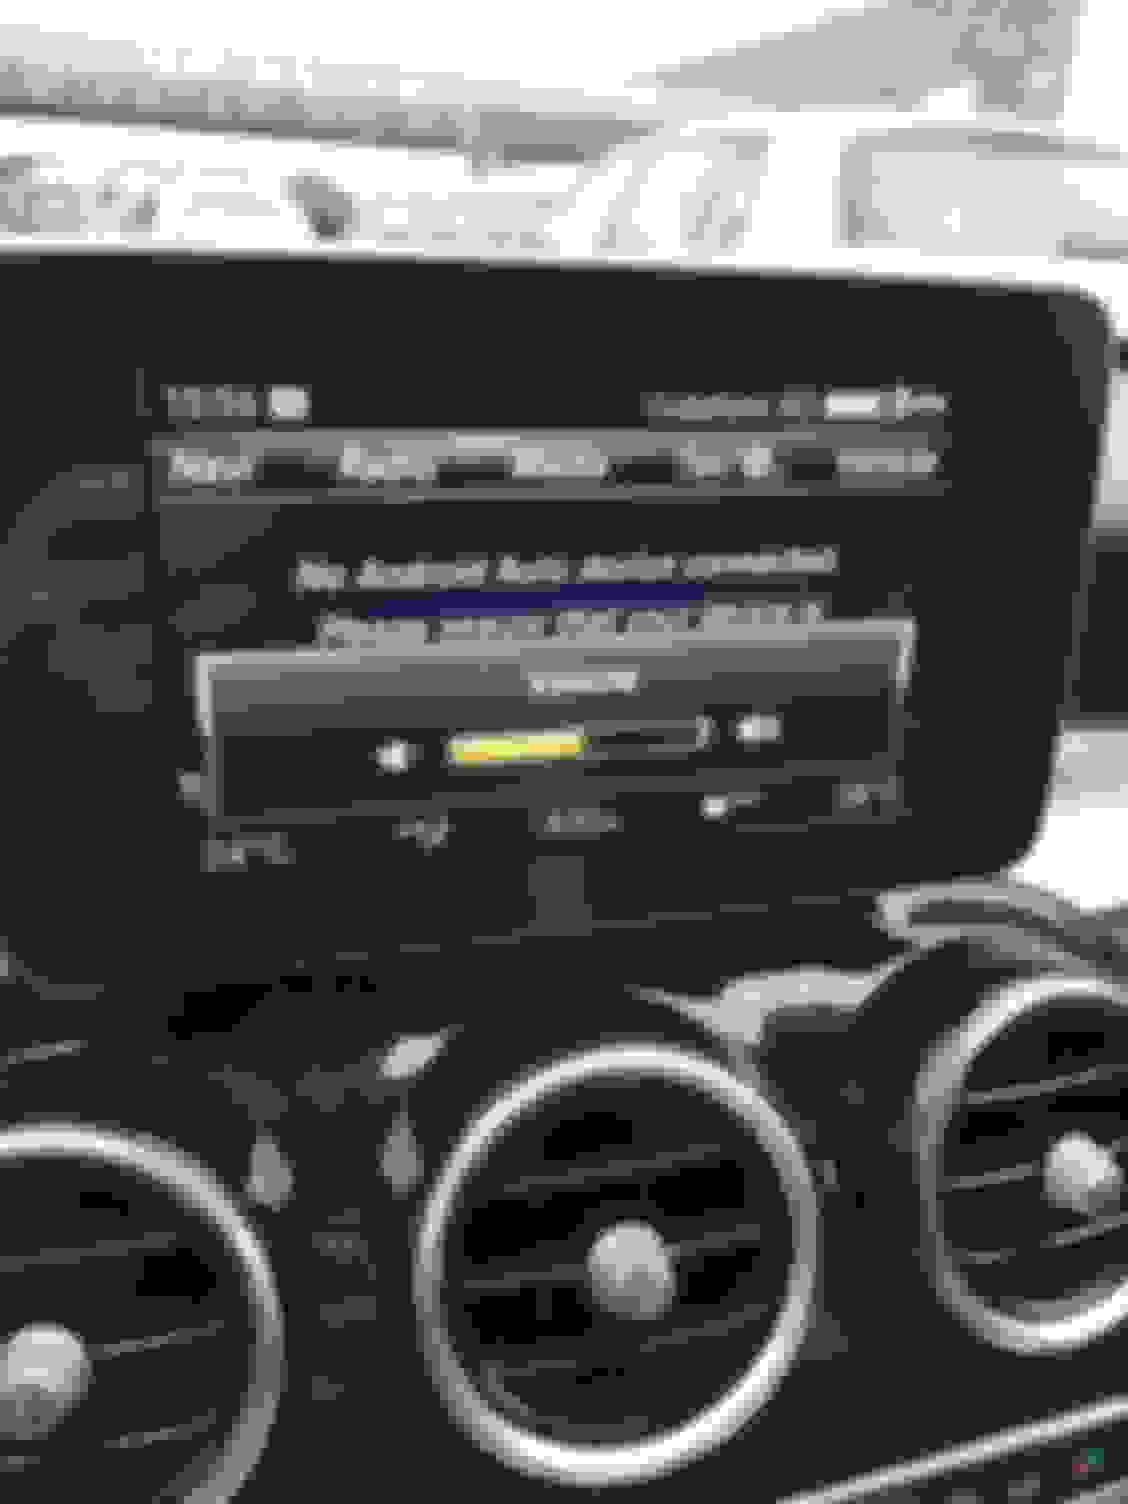 Retrofit CarPlay in W205 - Page 9 - MBWorld org Forums